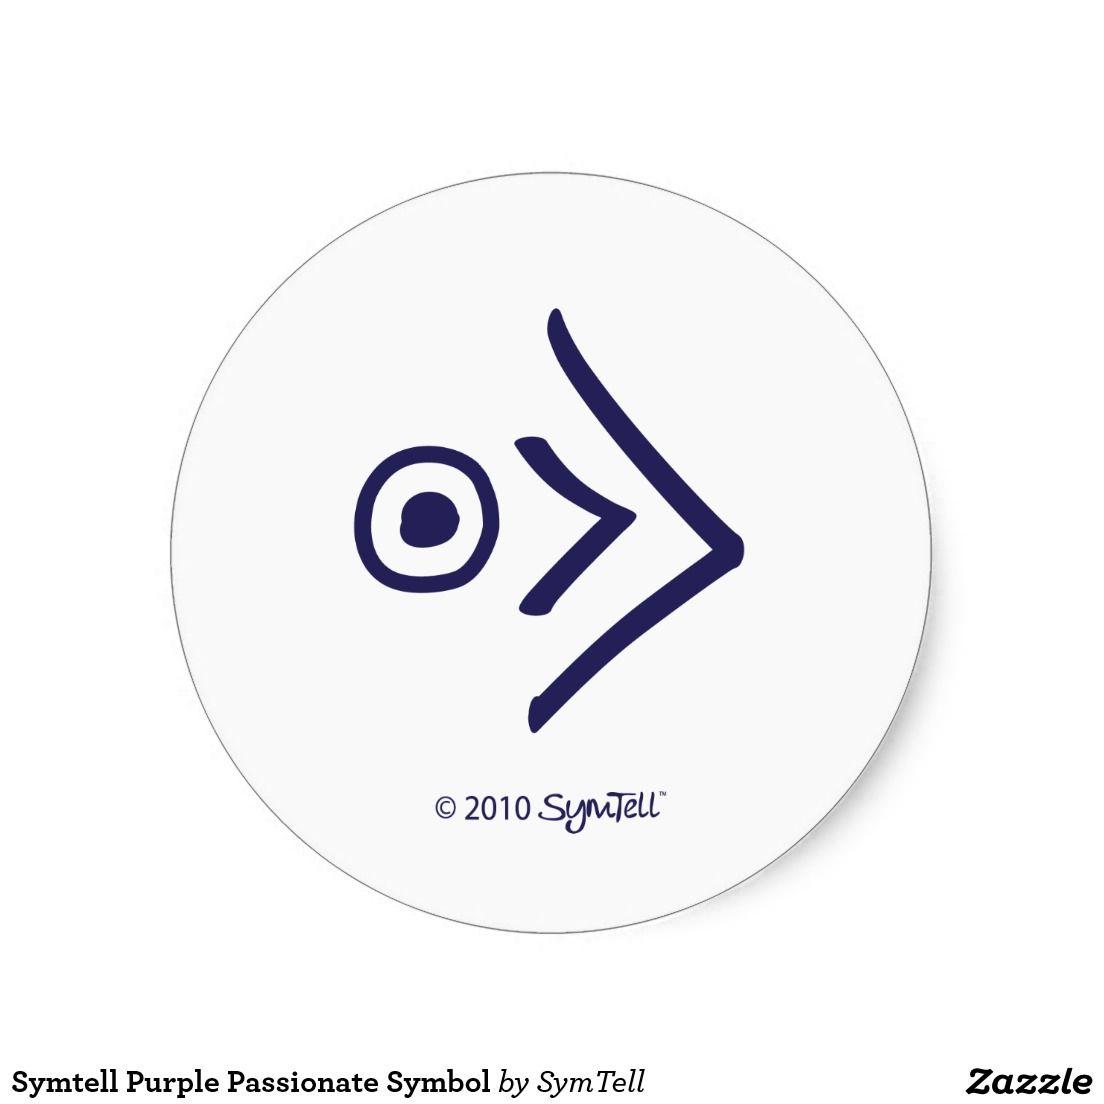 Symtell purple passionate symbol classic round sticker round symtell purple passionate symbol round sticker biocorpaavc Gallery